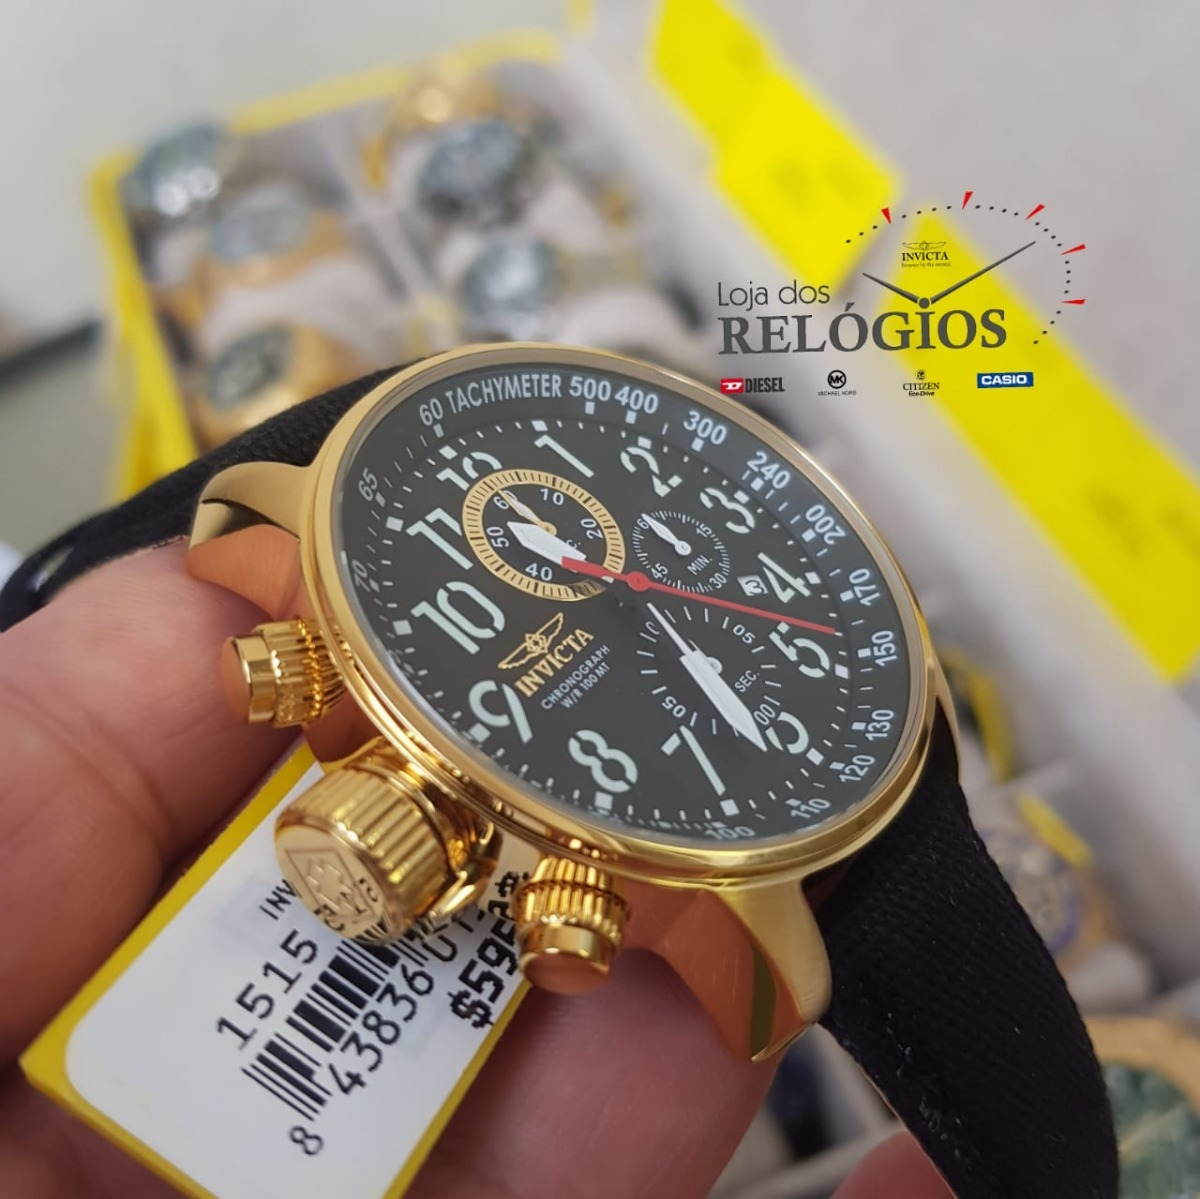 a5852161f3a relógio invicta iforce 1515 original puls.couro revestido. Carregando zoom.